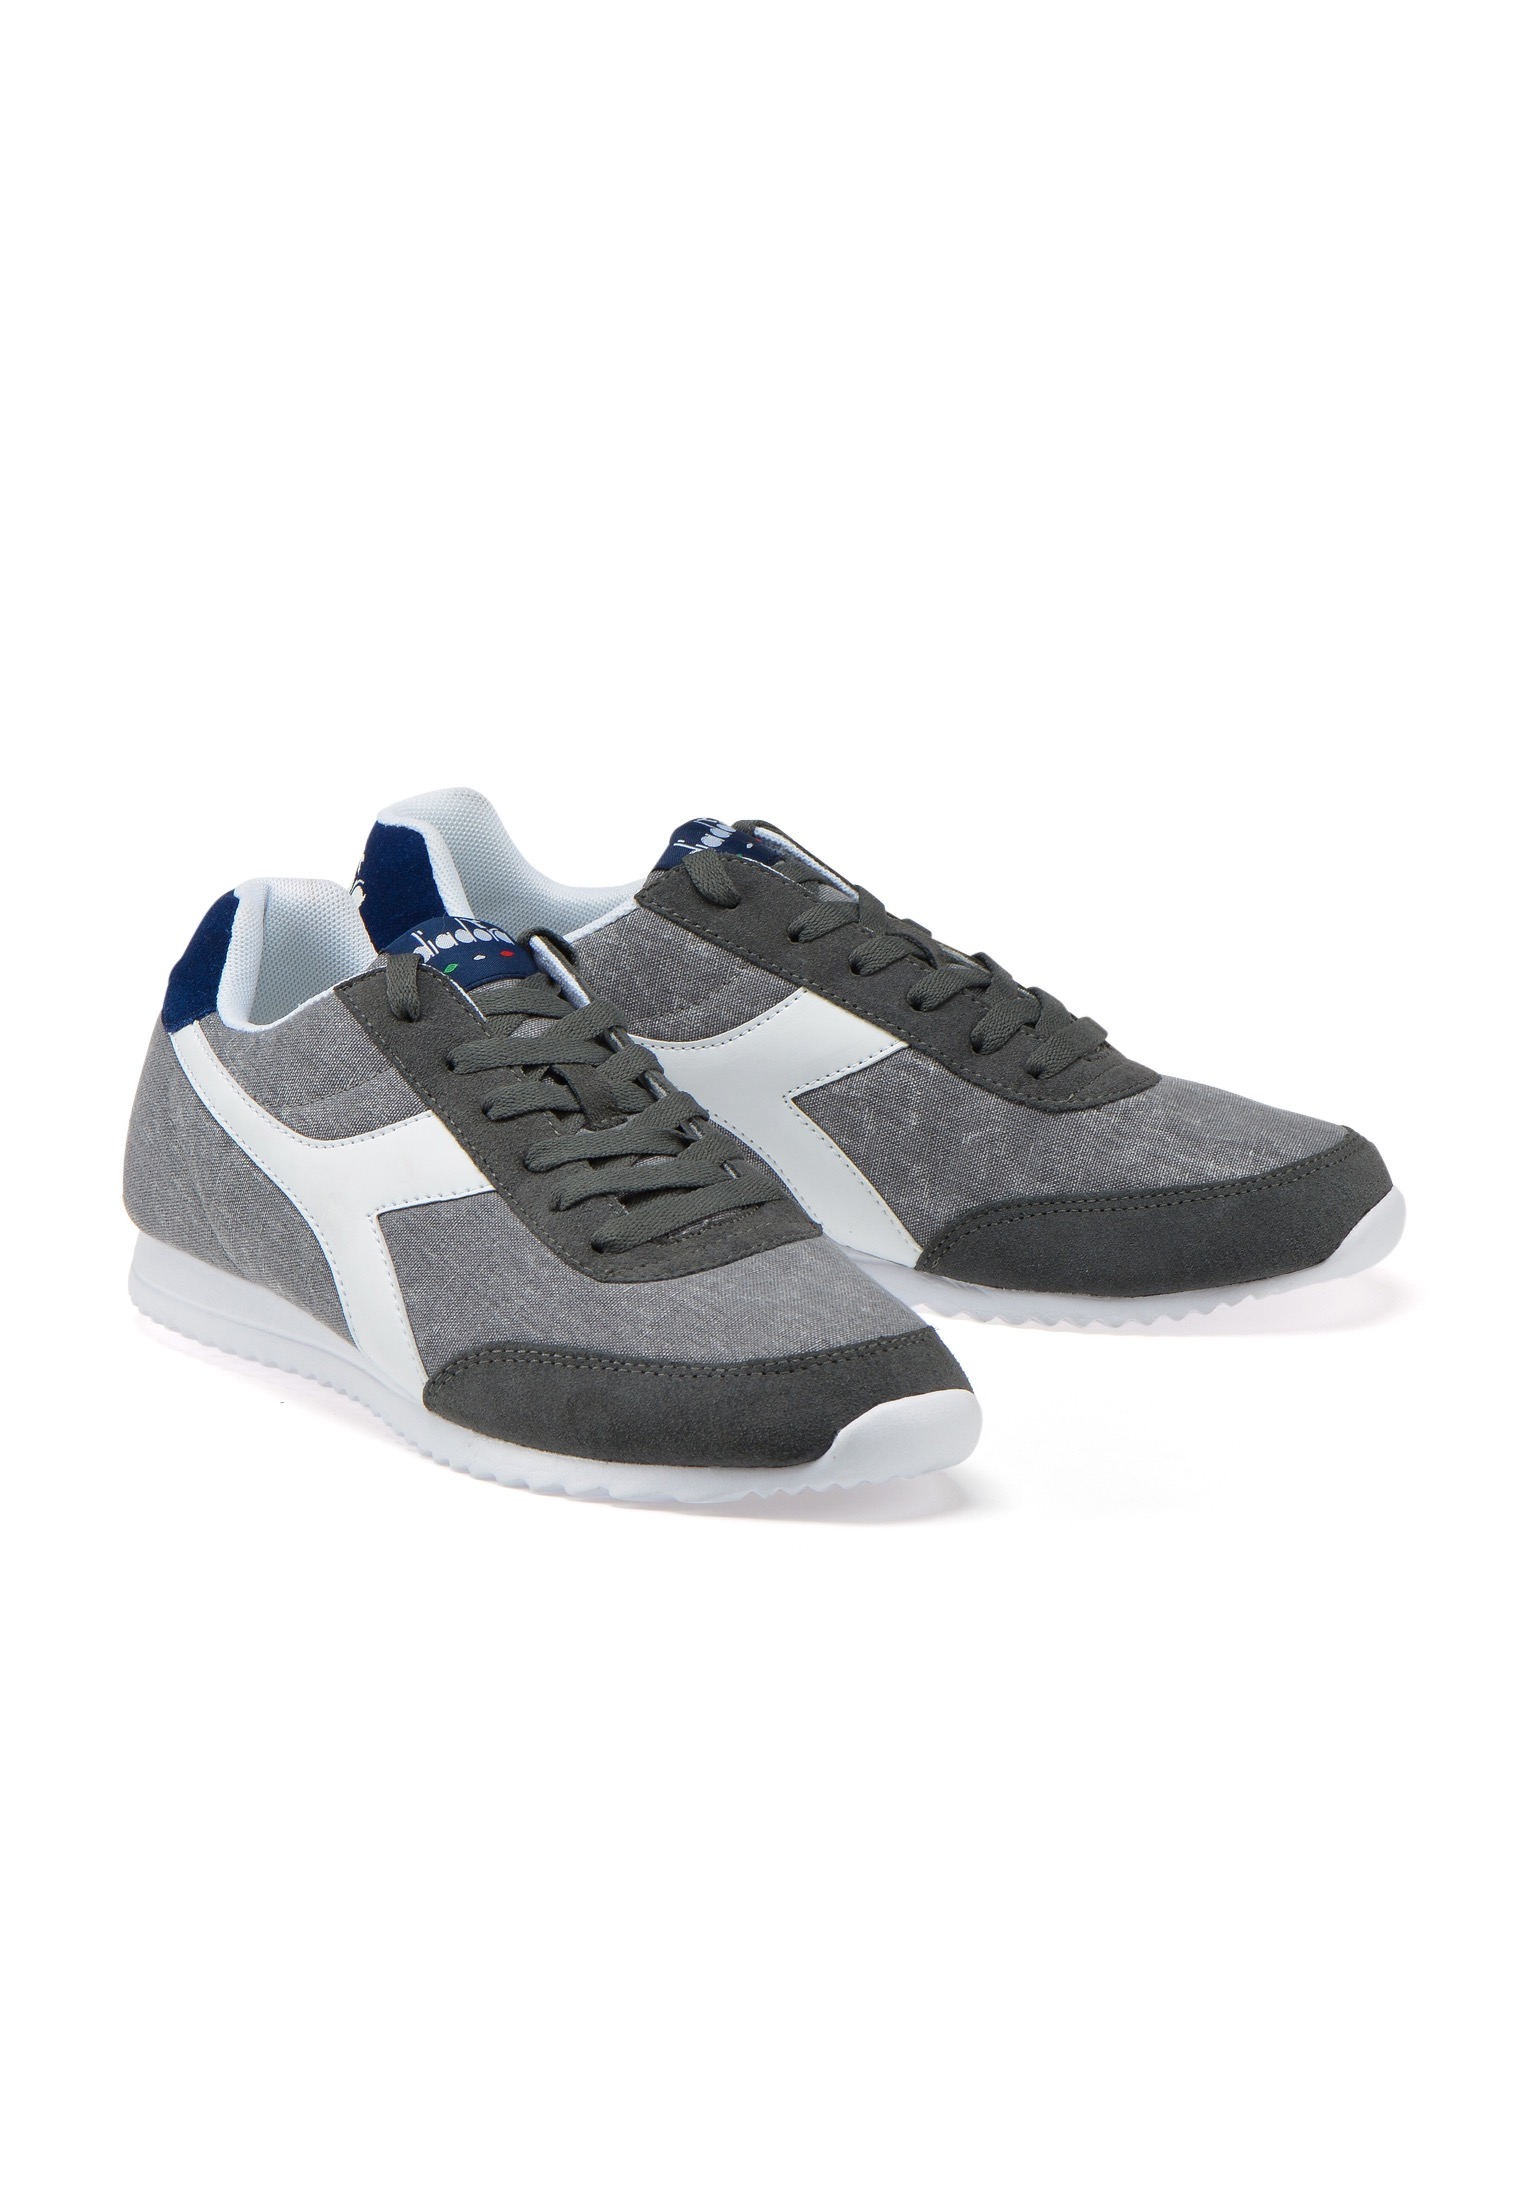 Scarpe-Diadora-Jog-Light-C-Sneakers-sportive-uomo-donna-vari-colori-e-taglie miniatura 78